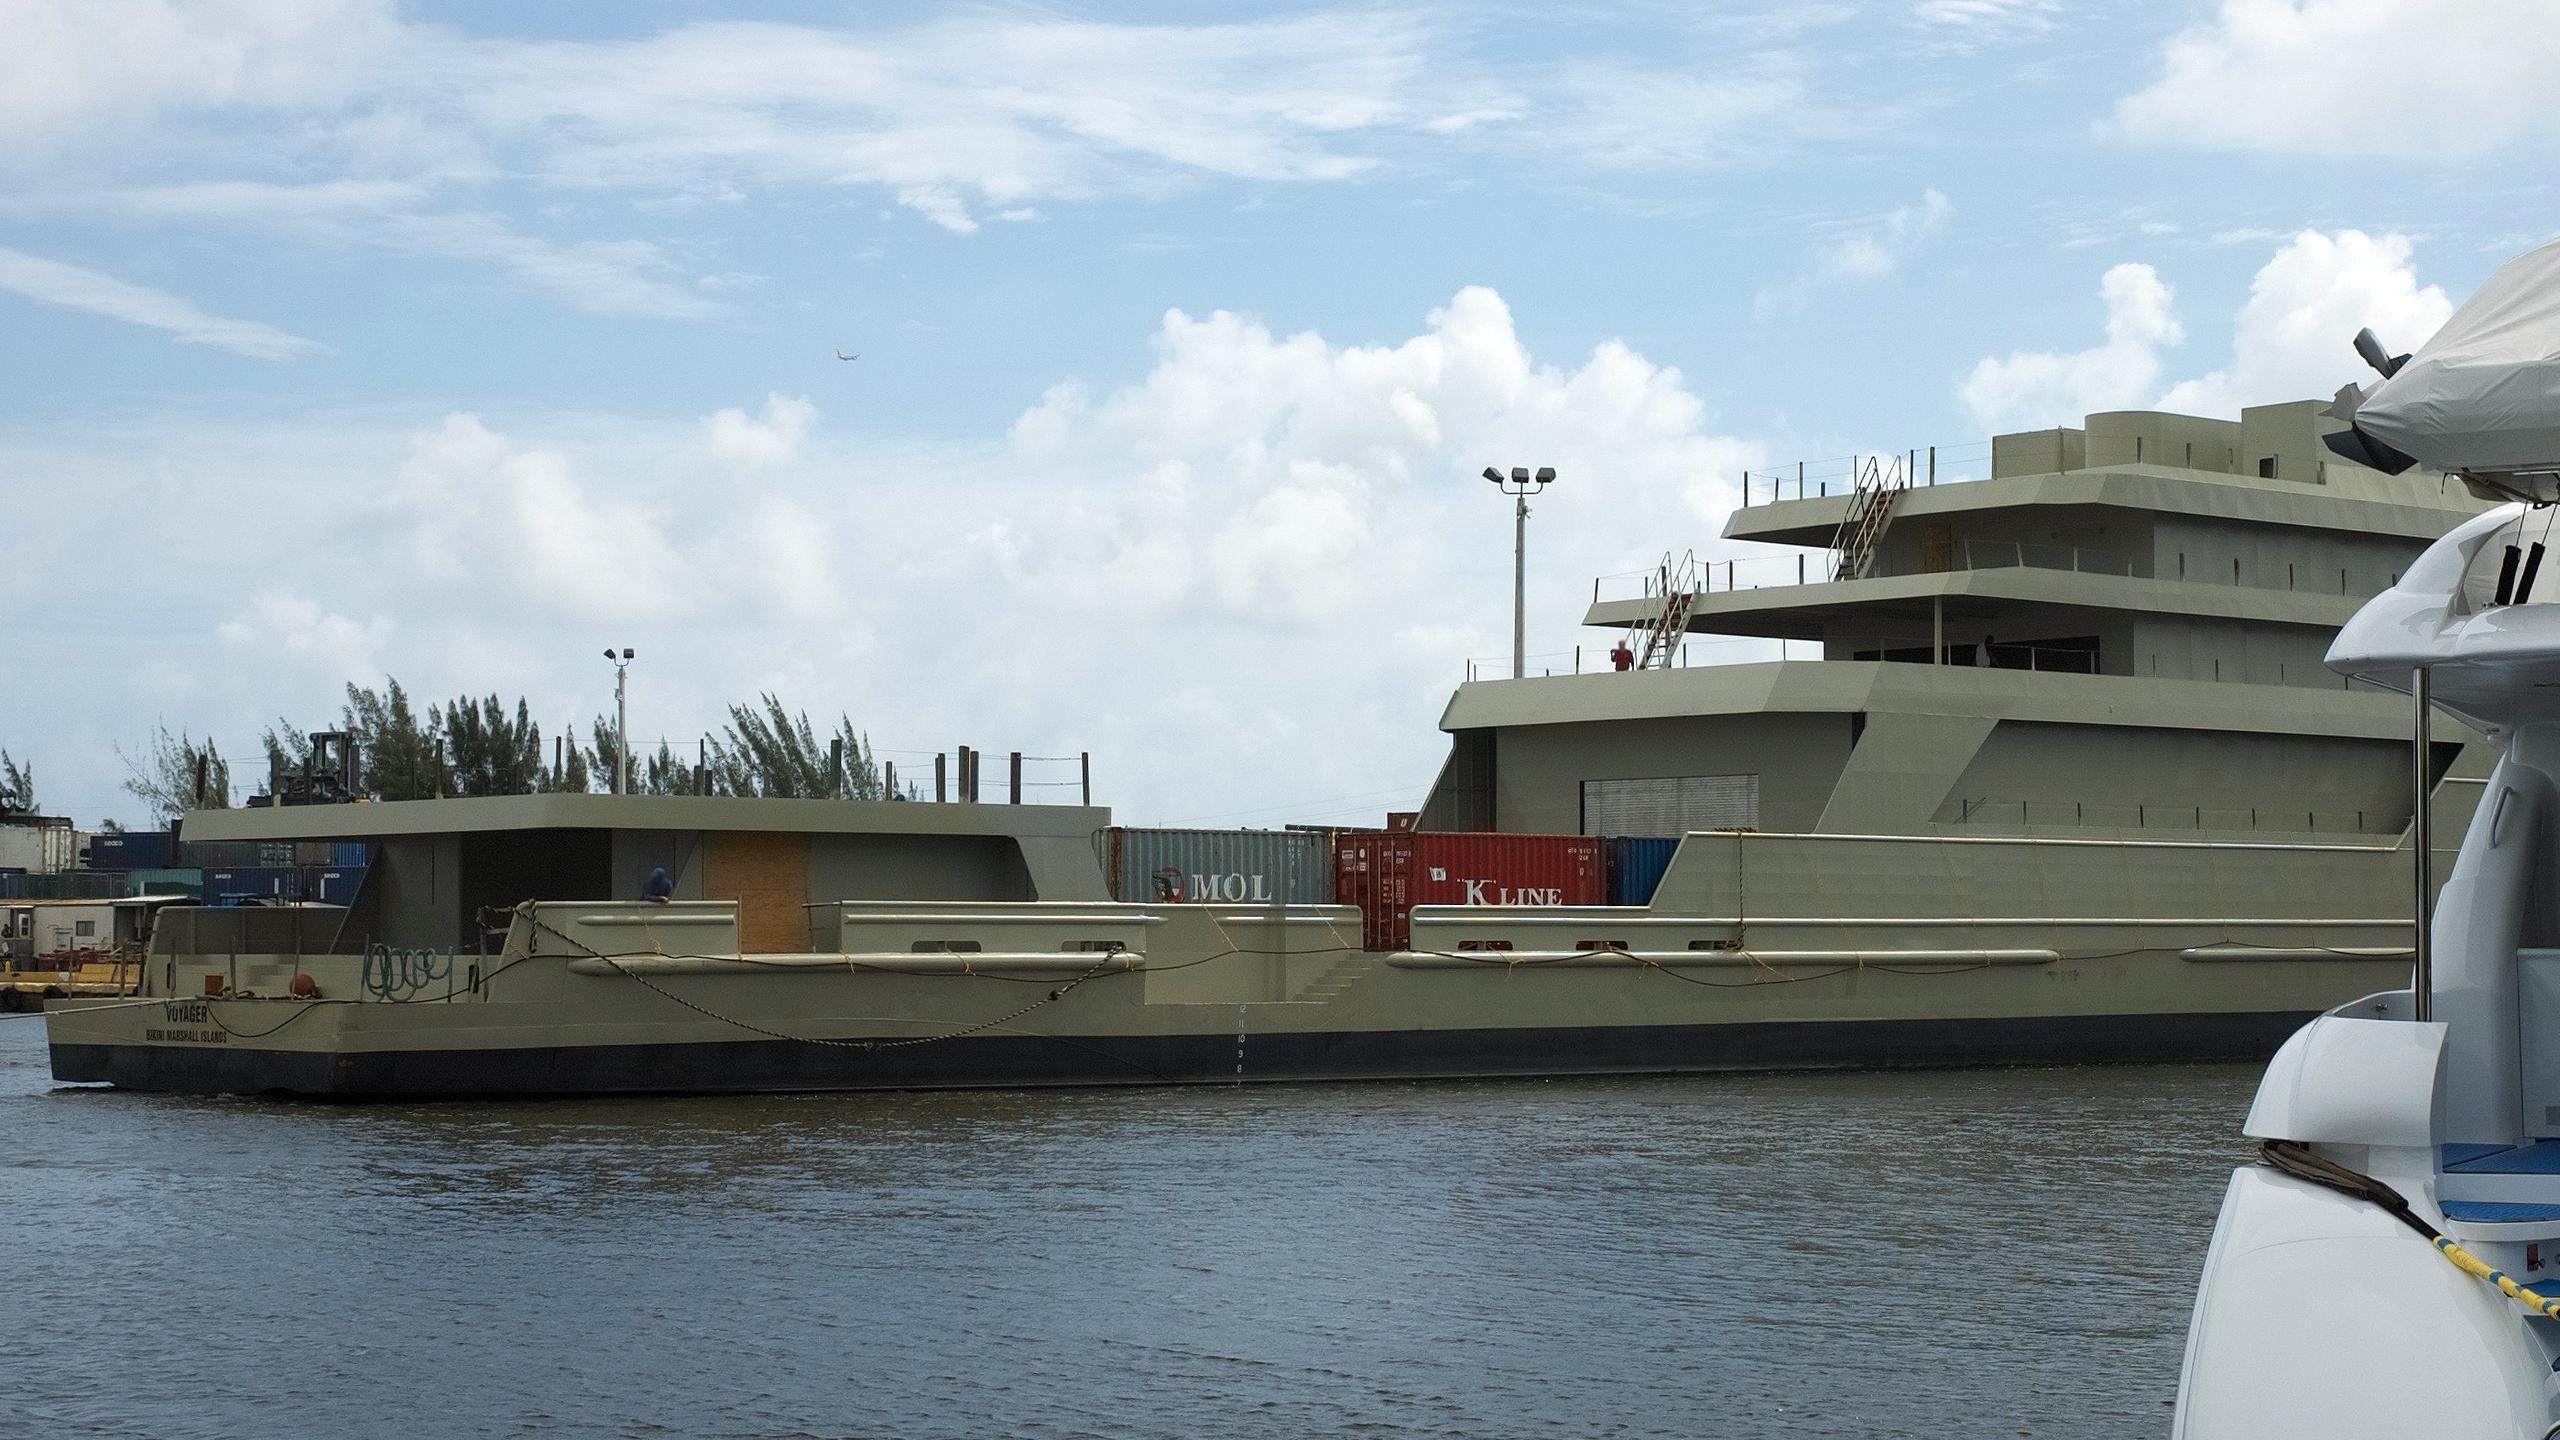 voyager-motoryacht-swiftships-1997-78m-half-profile-stern